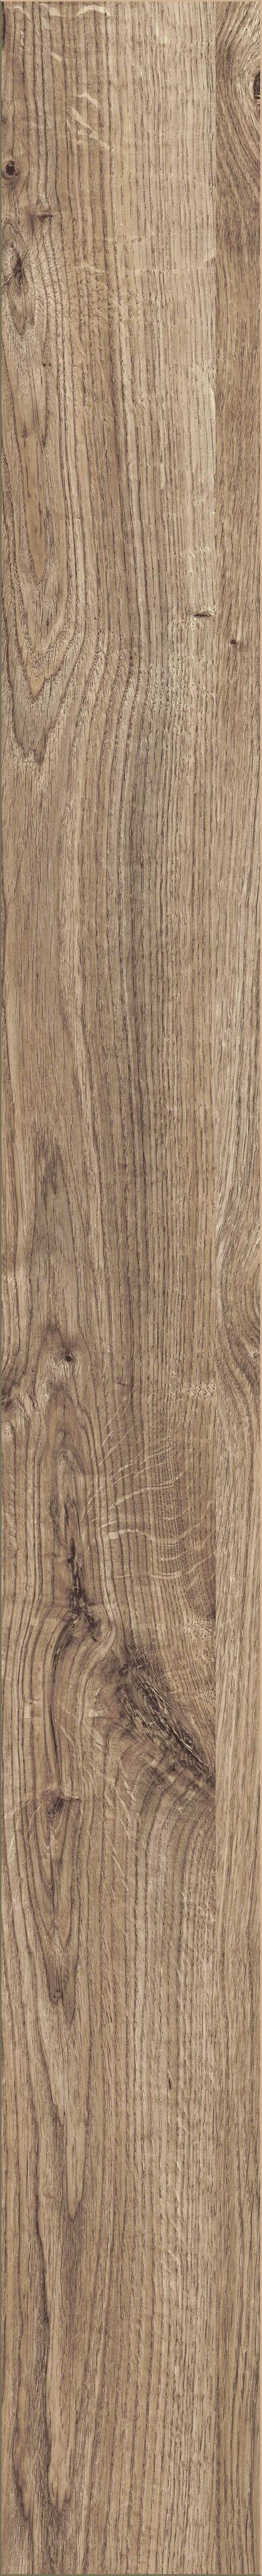 kronotex mammut laminat everest oak beige d 3081 von. Black Bedroom Furniture Sets. Home Design Ideas